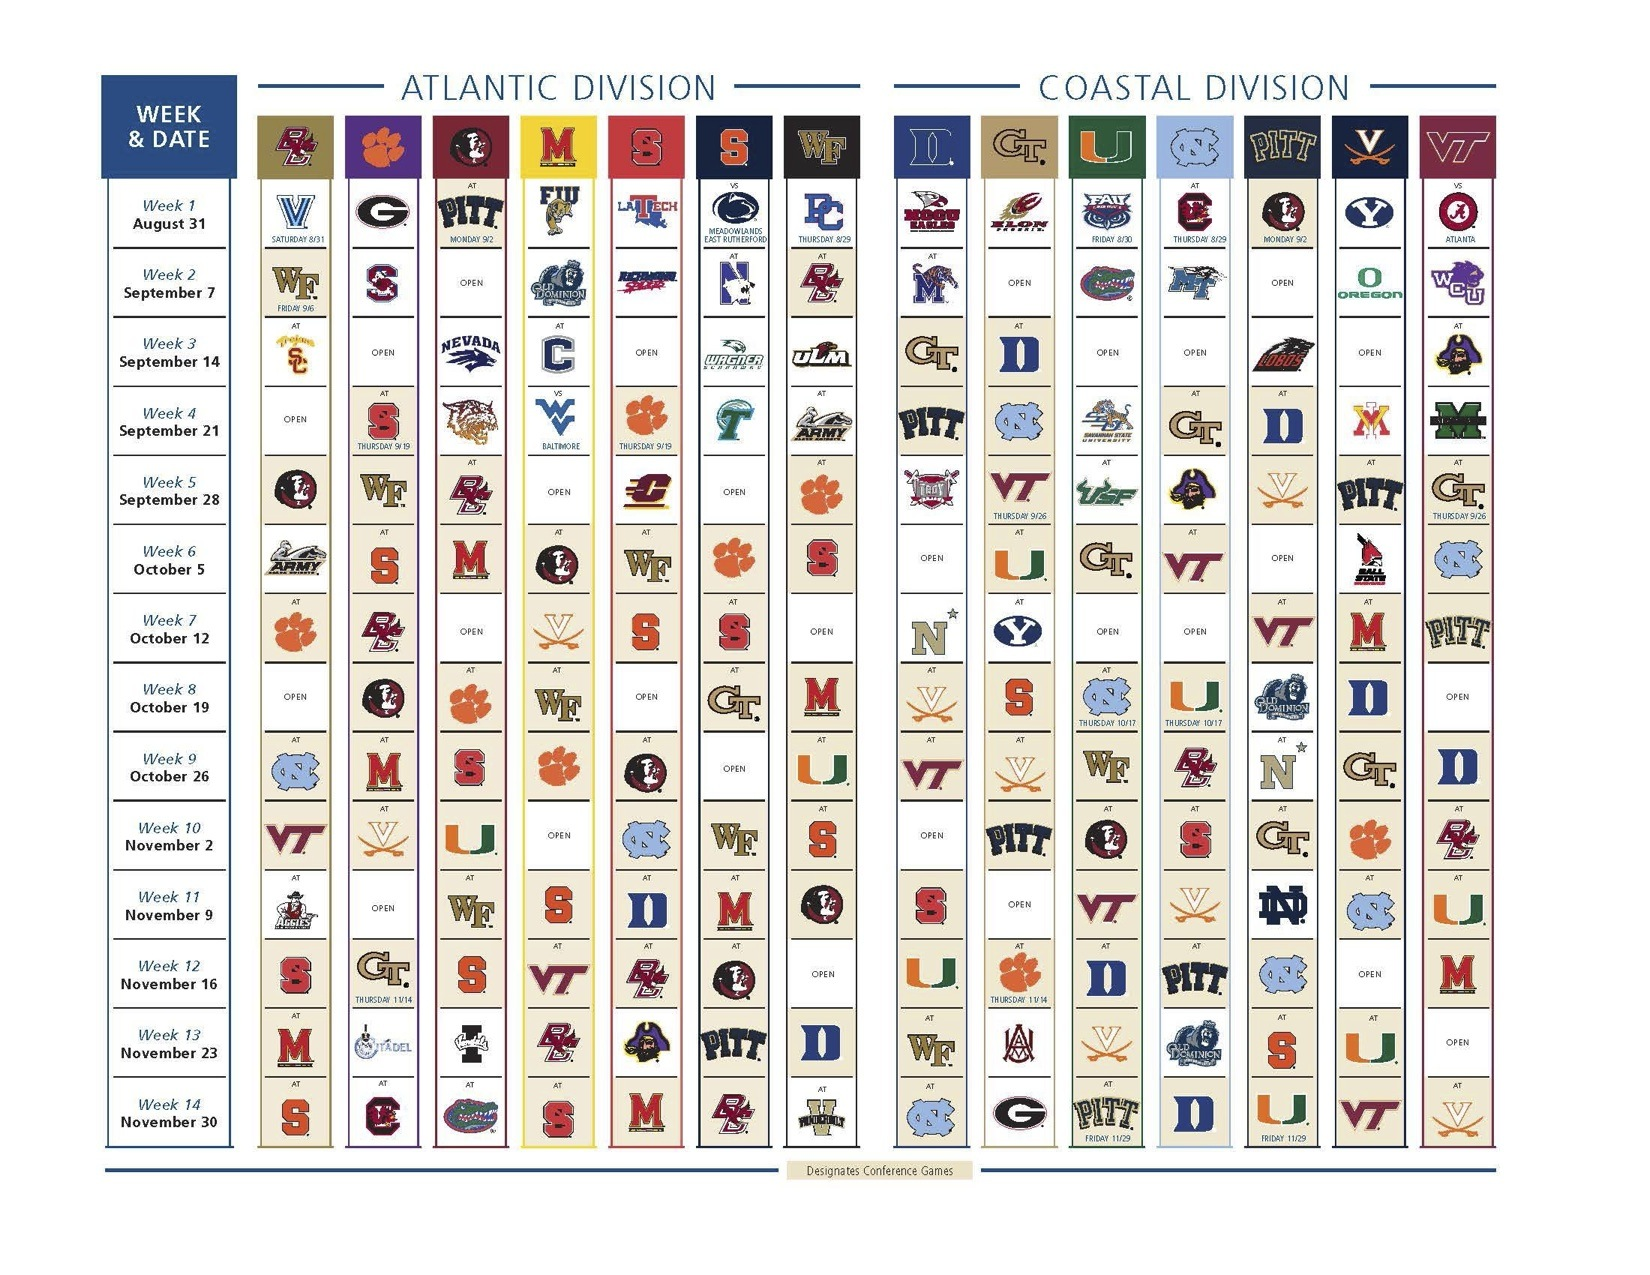 Unc Basketball Tv Schedule 2014